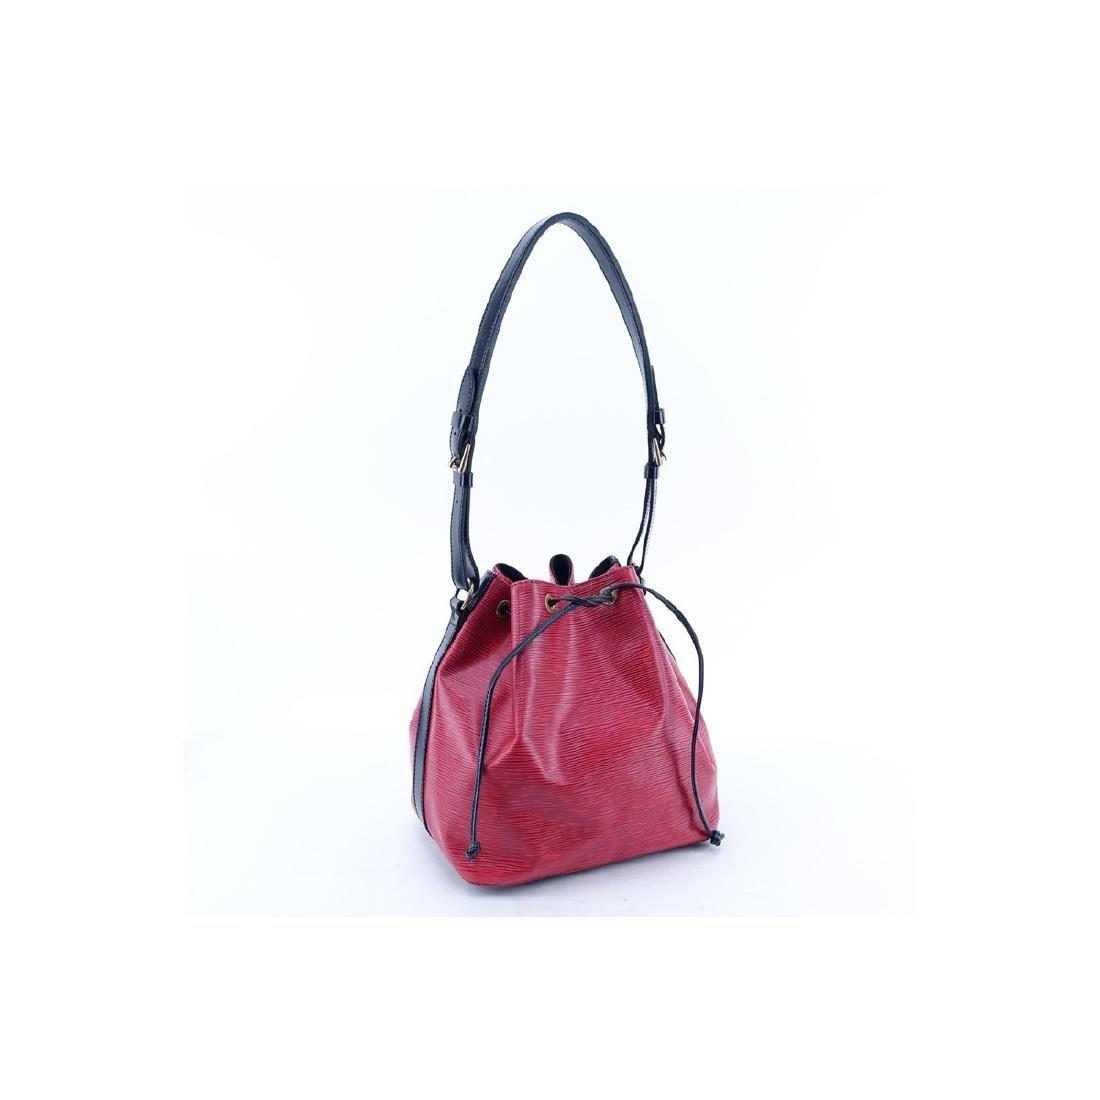 Louis Vuitton Red/Black Epi Leather Noe Bicolor